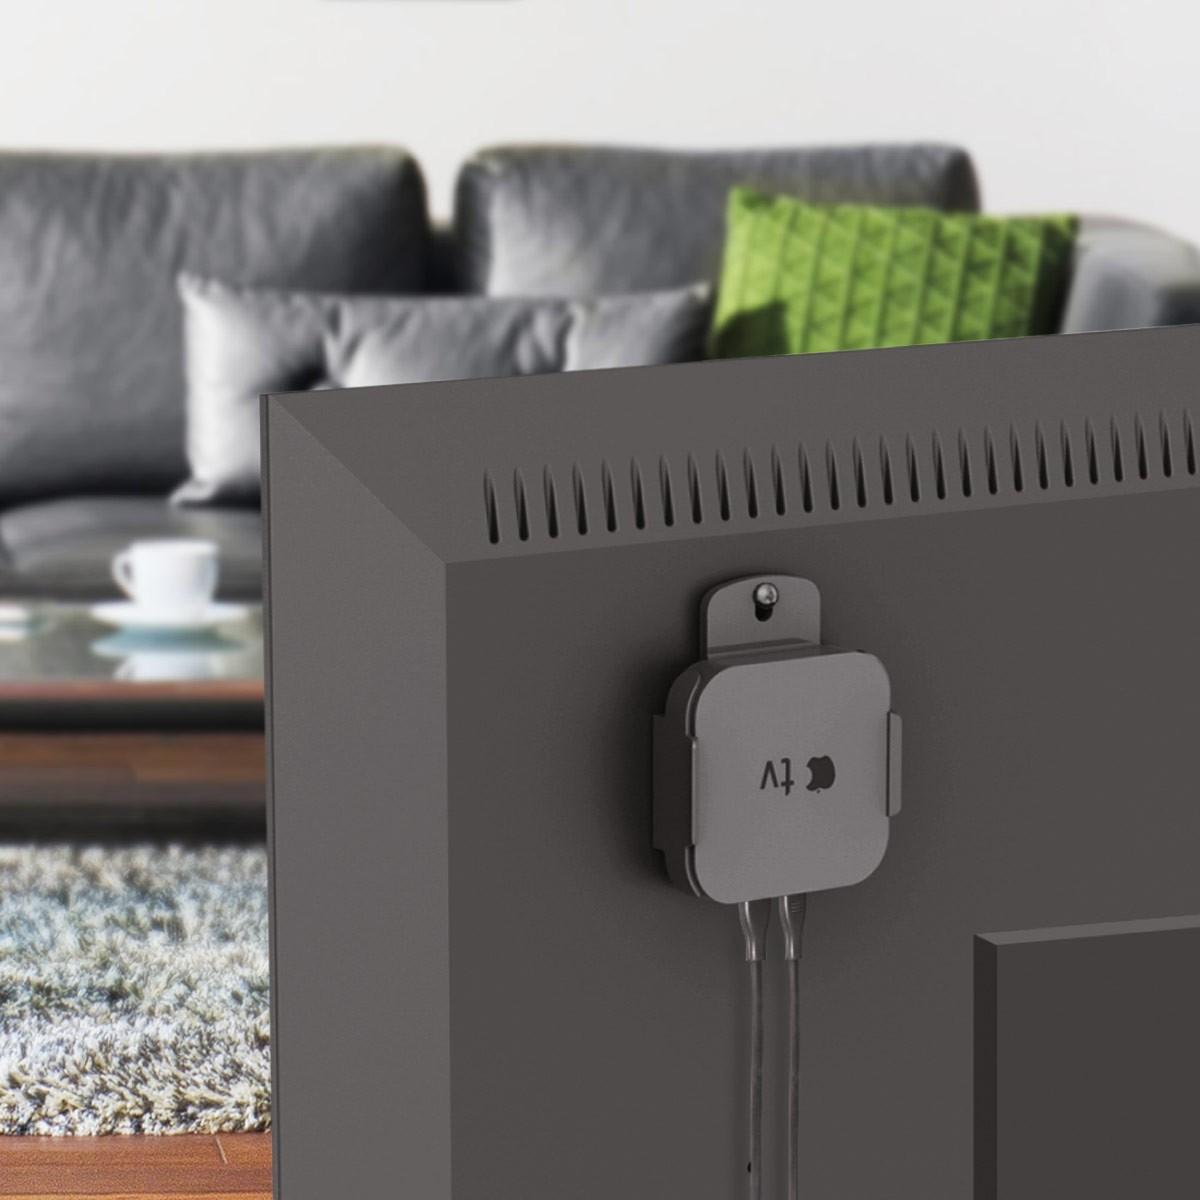 halterung apple tv 2 3 airport express 2 wand aptv01 10918. Black Bedroom Furniture Sets. Home Design Ideas